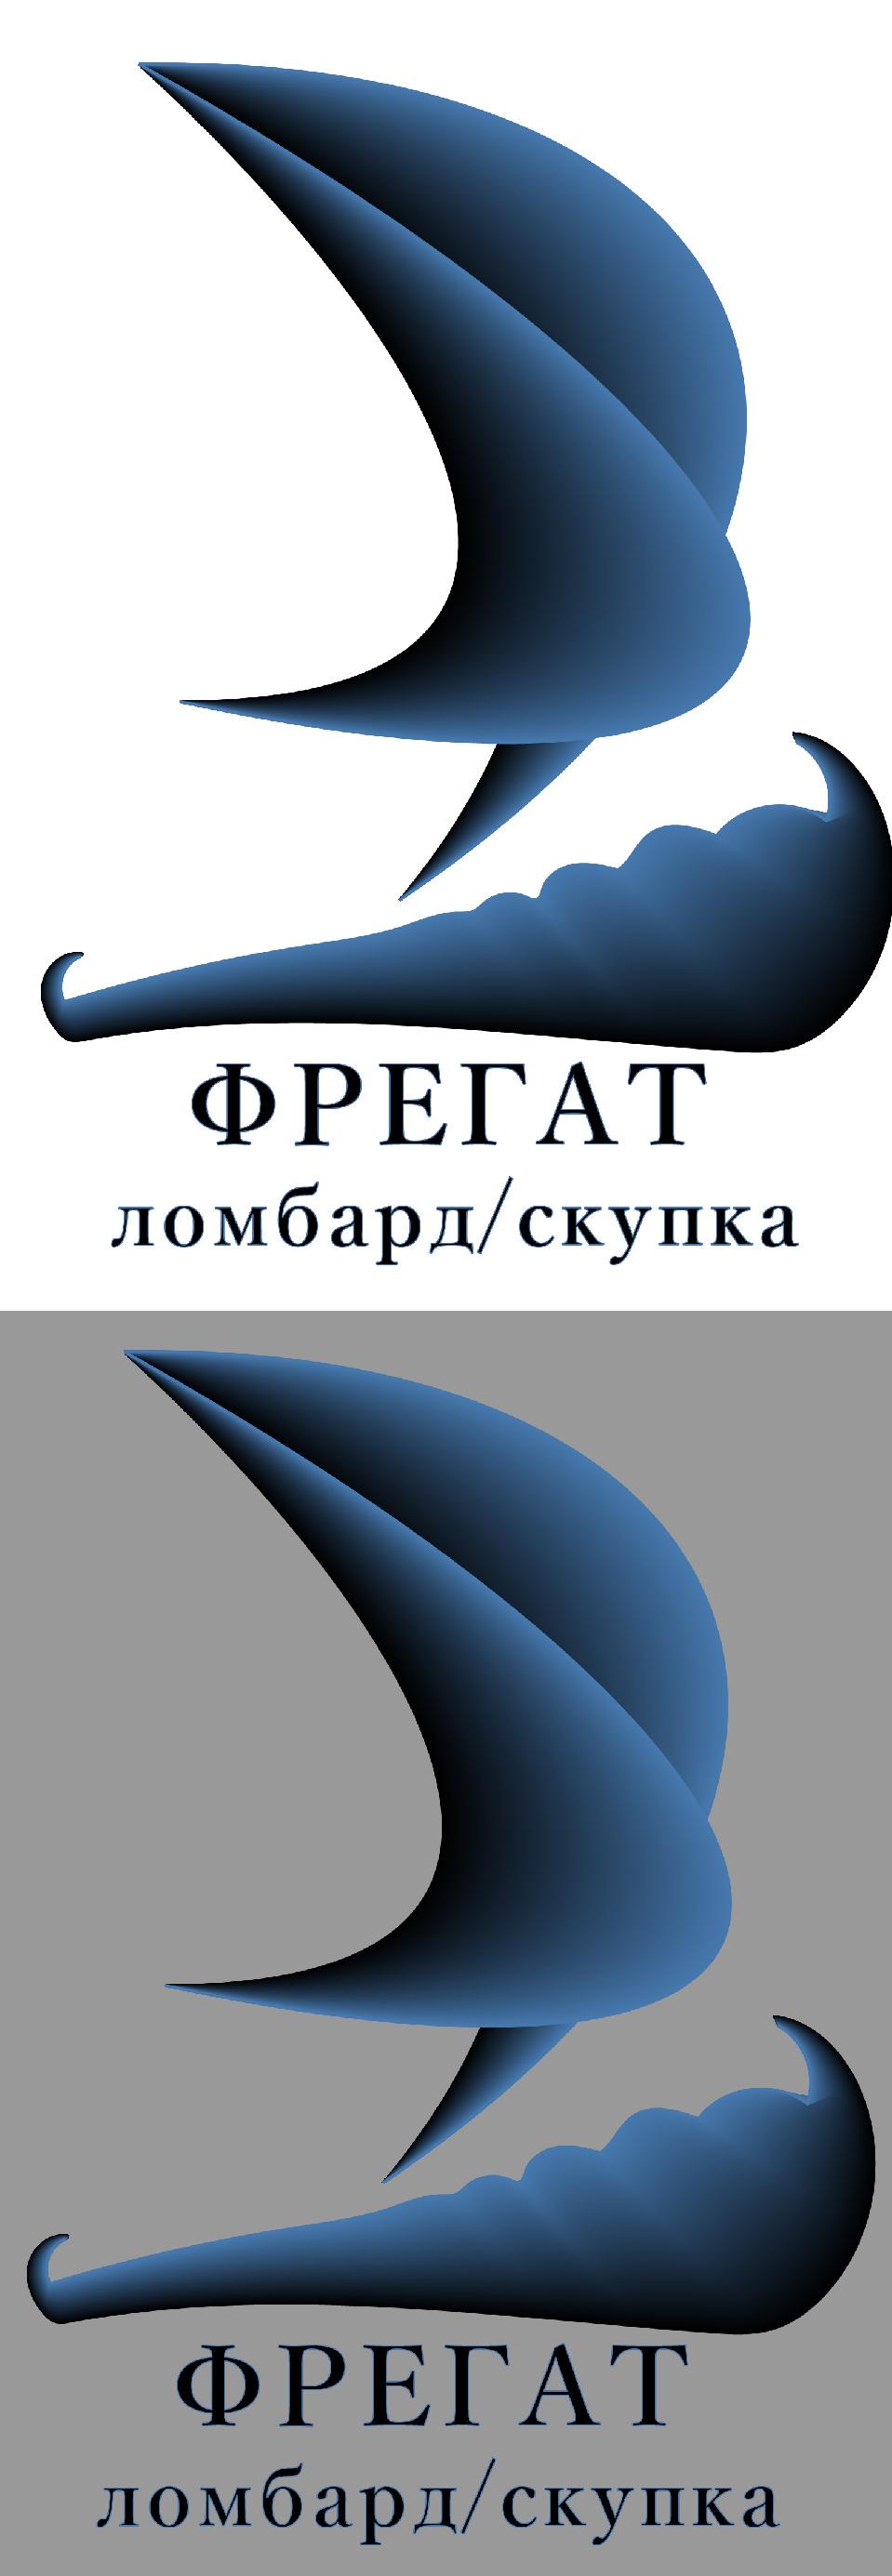 "Логотип, фирменный стиль Ломбард ""Фрегат"" фото f_8285bc624ff937b4.jpg"